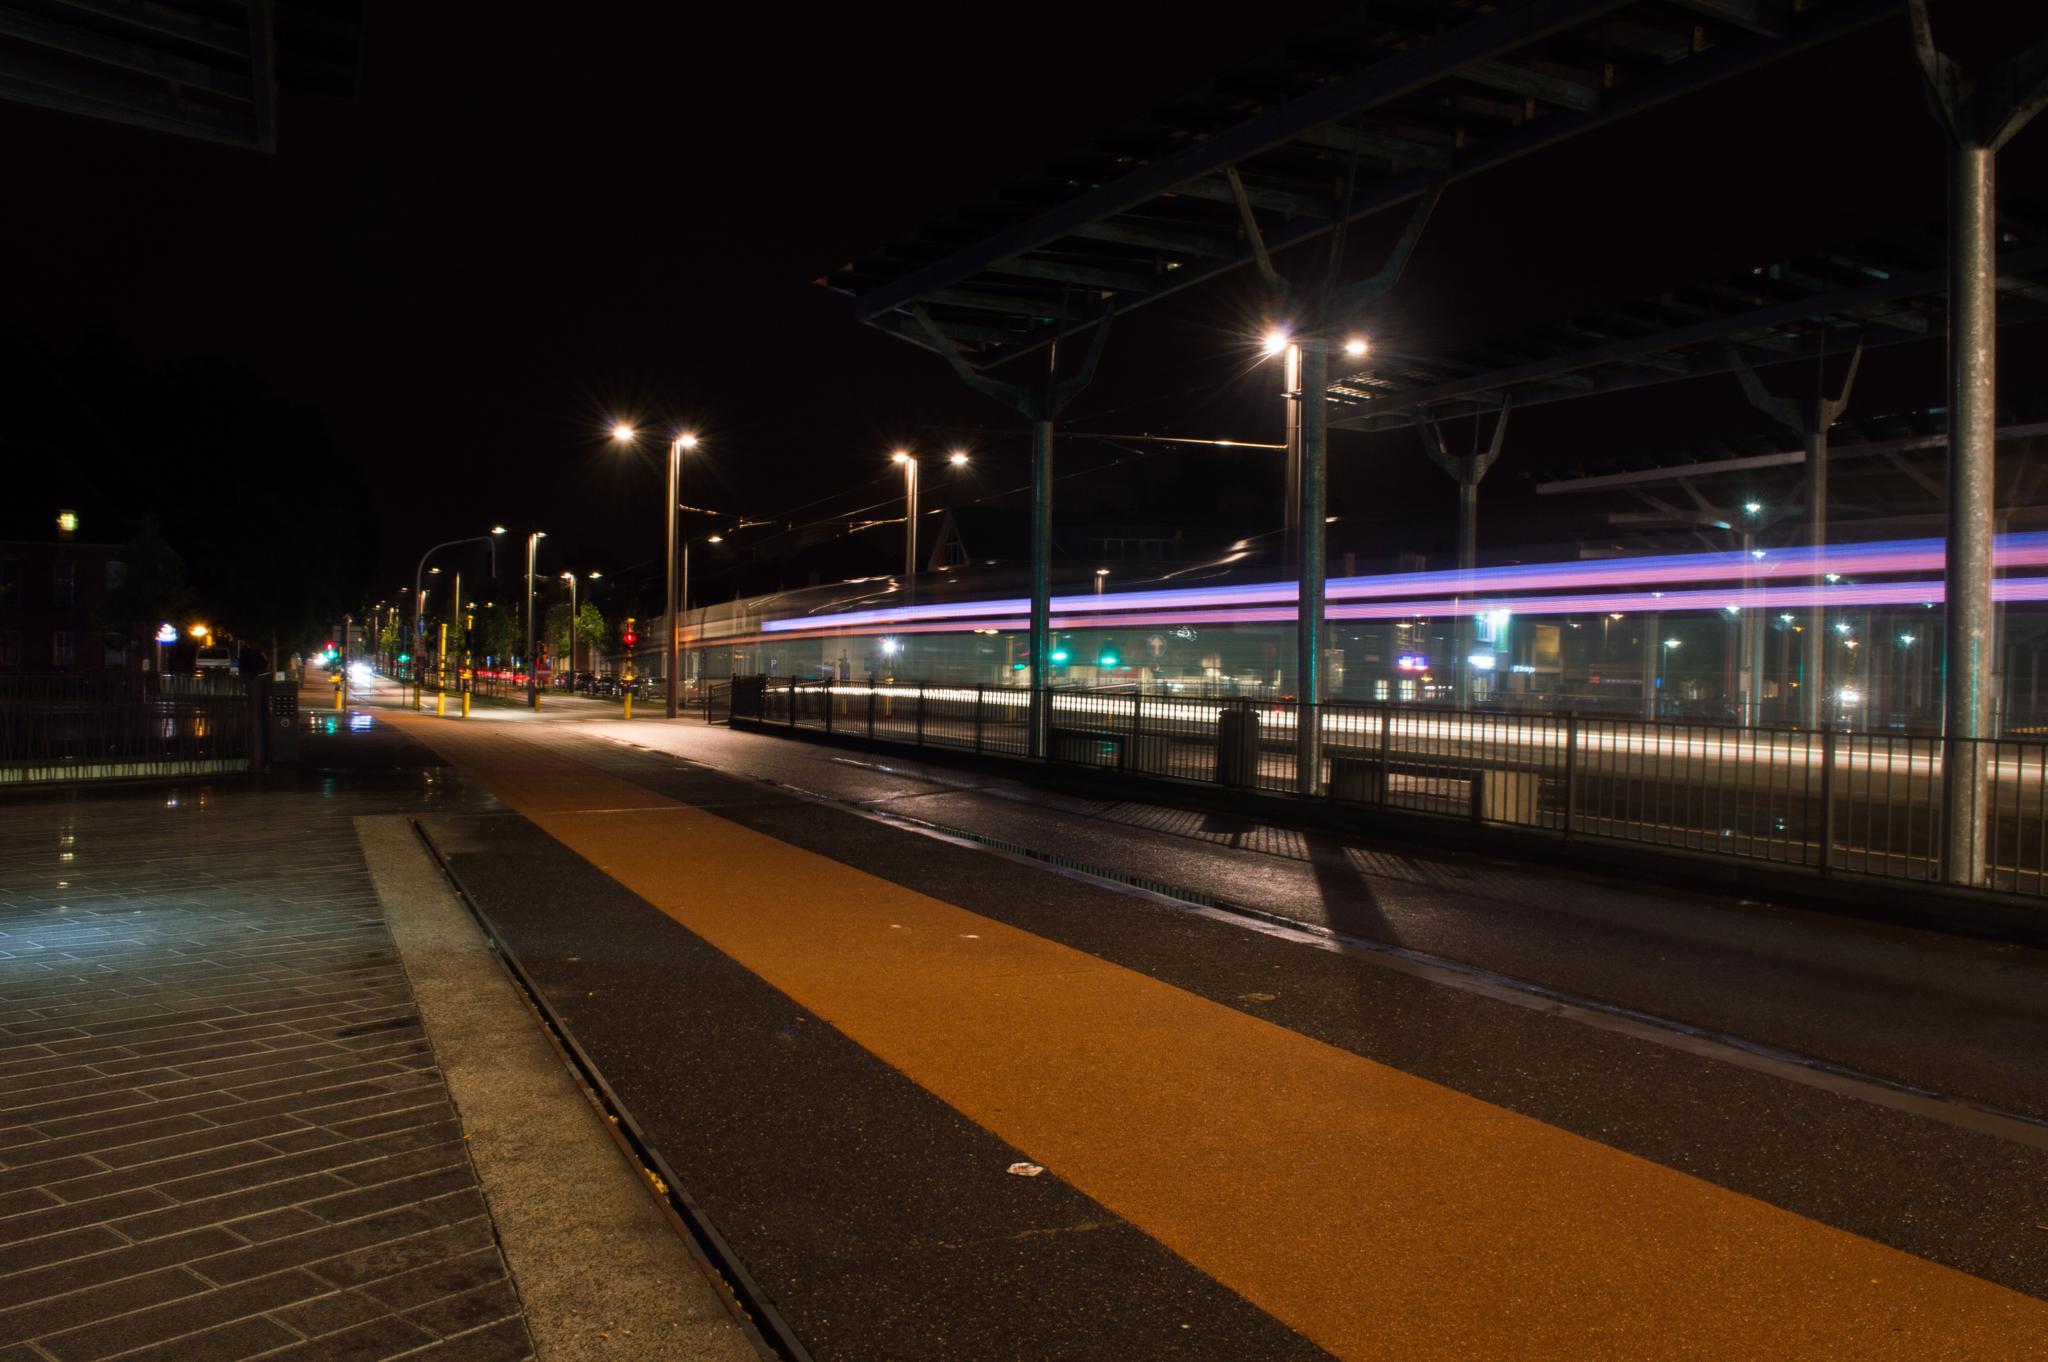 Streetcar by Sander